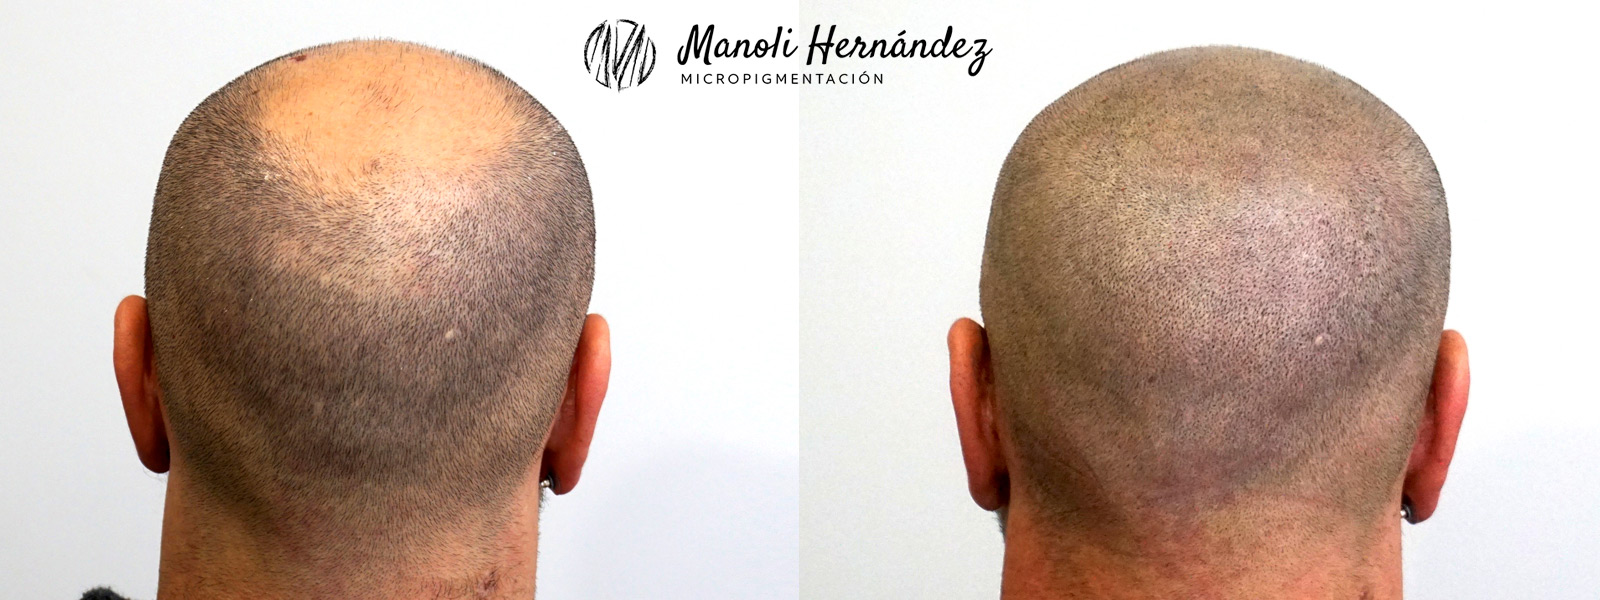 Tratamiento de micropigmentación capilar para tratar alopecia